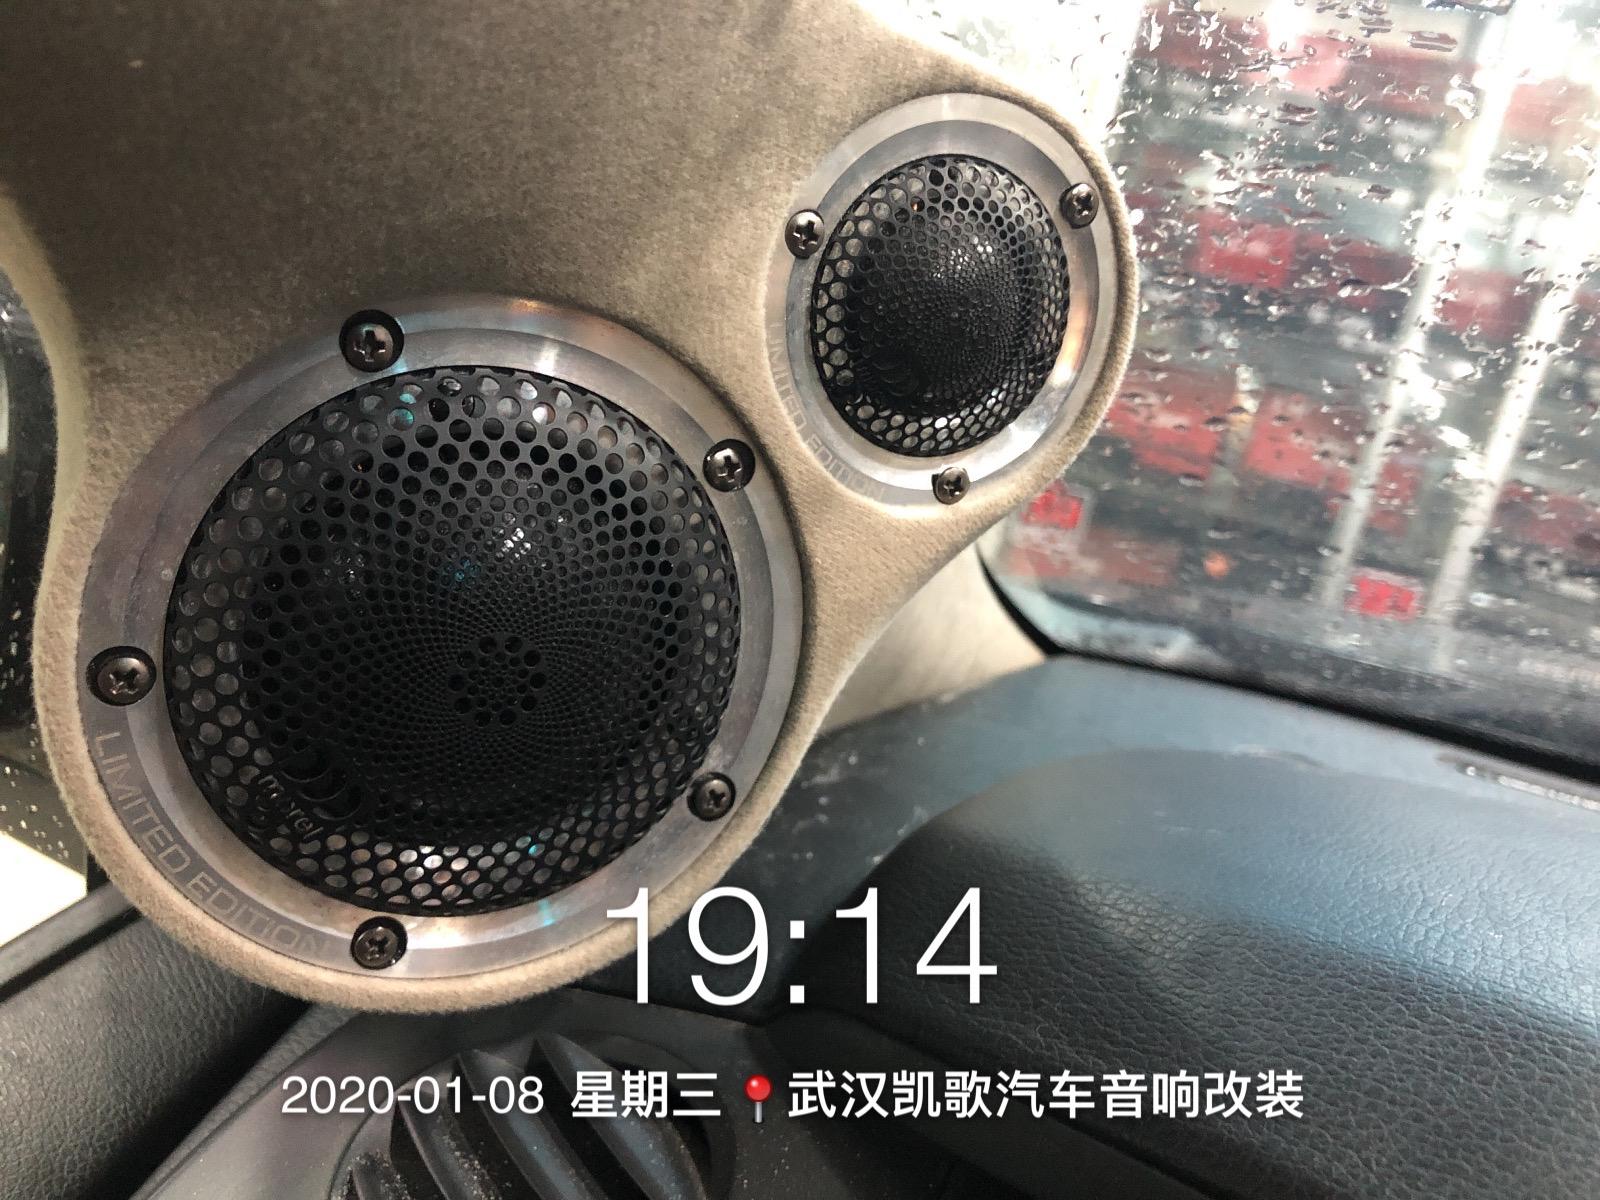 �e�W5姹借溅�冲���硅�妗�渚�